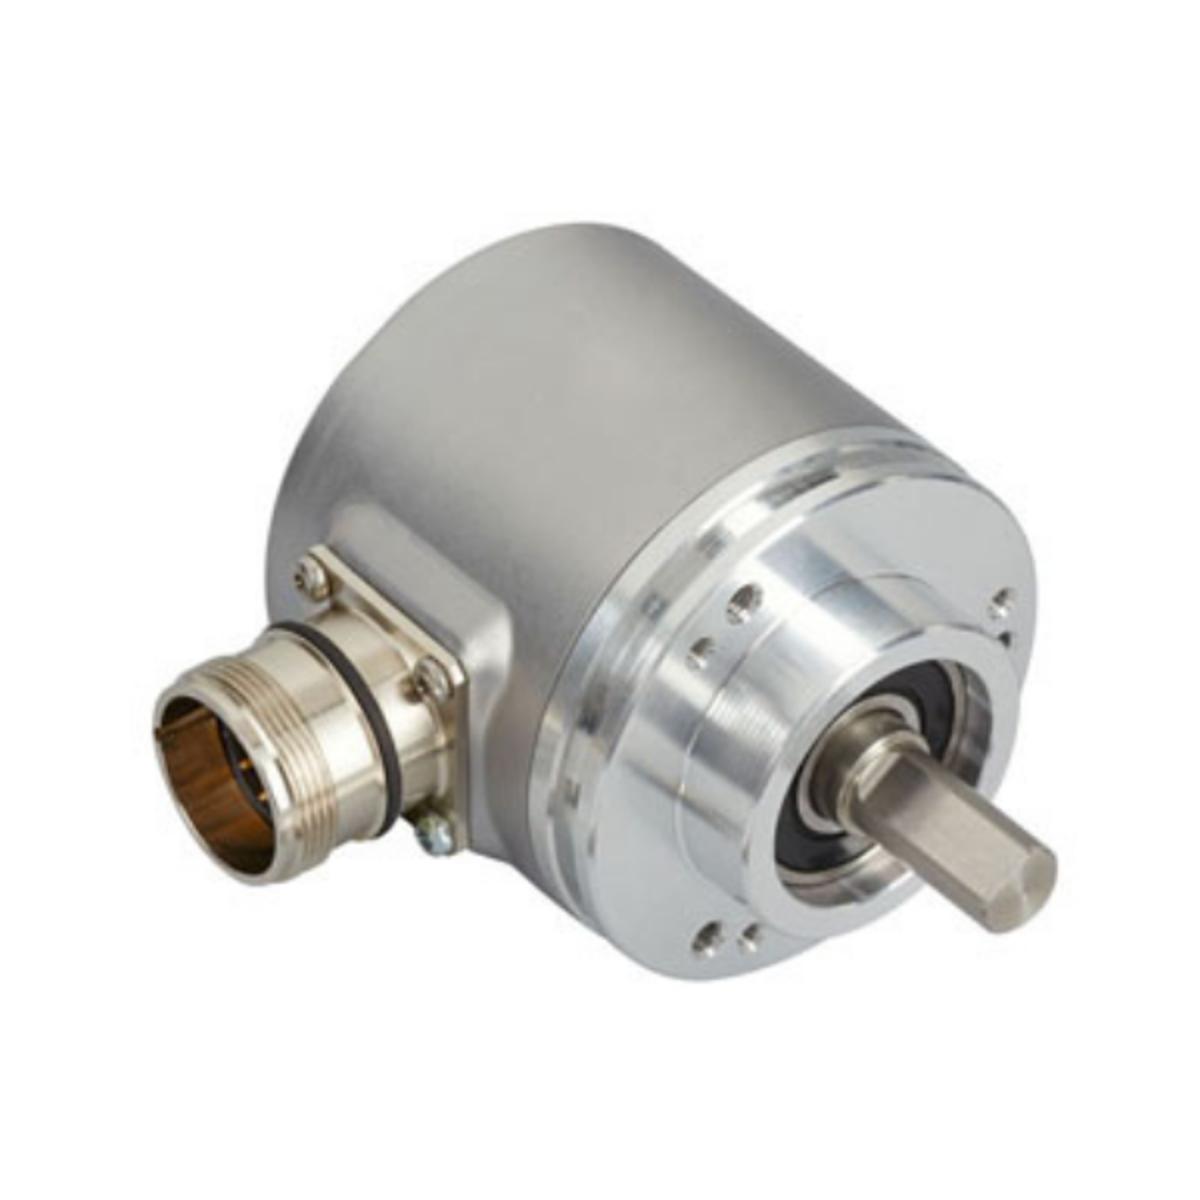 POSITAL UCD-IPH00-01024-L10S-053 Incremental Encoder